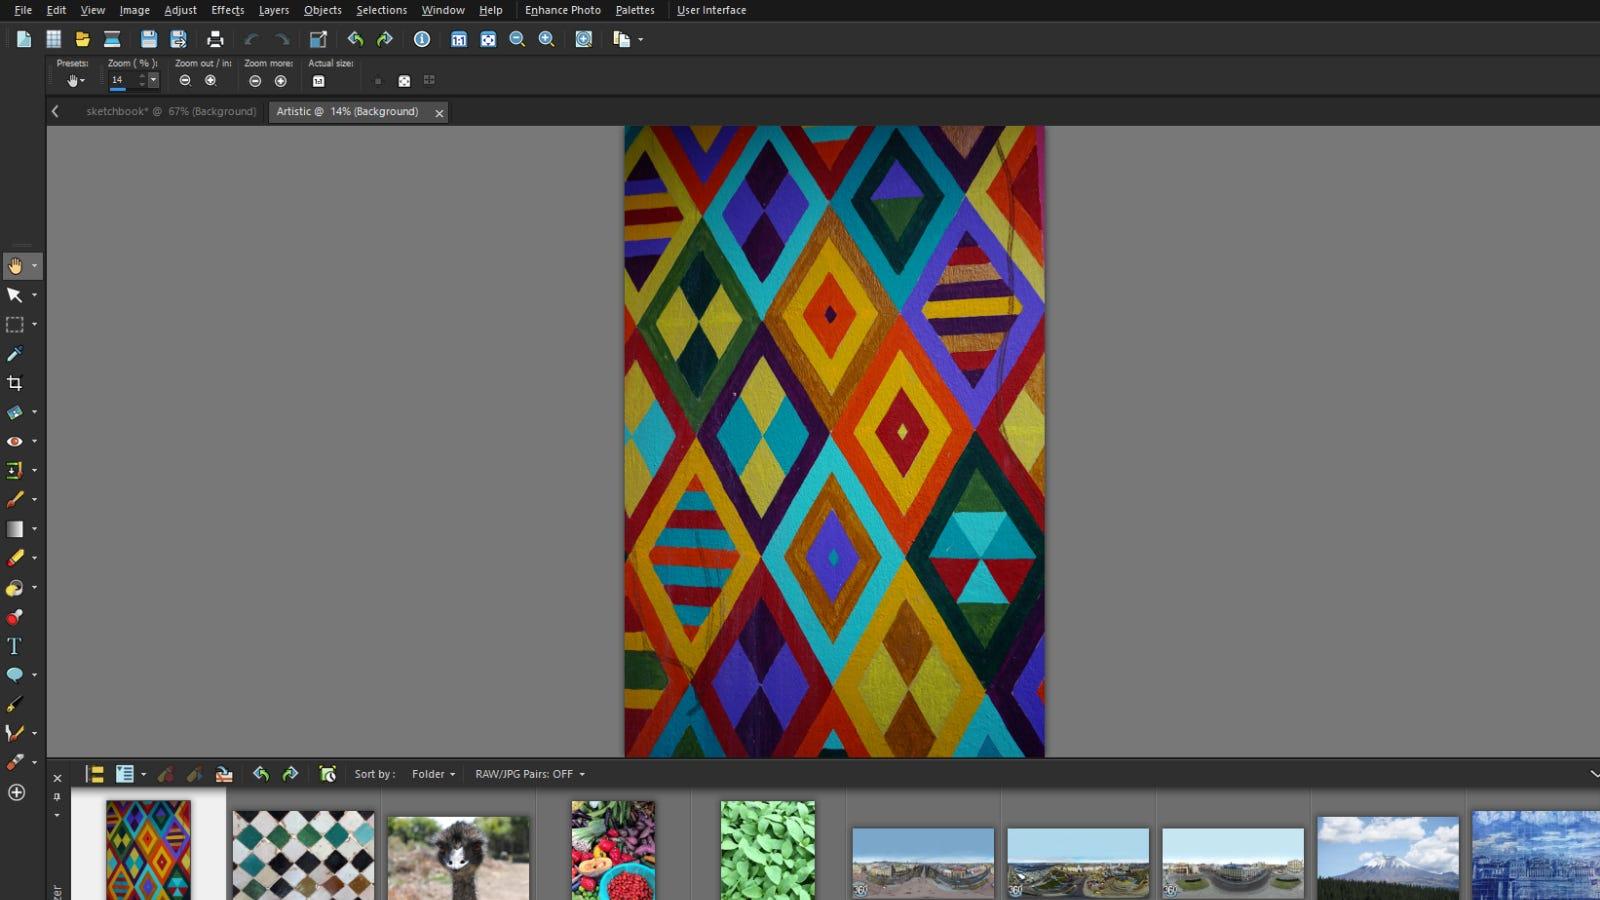 Screenshot of Corel PaintShop Pro 2021 main editing page